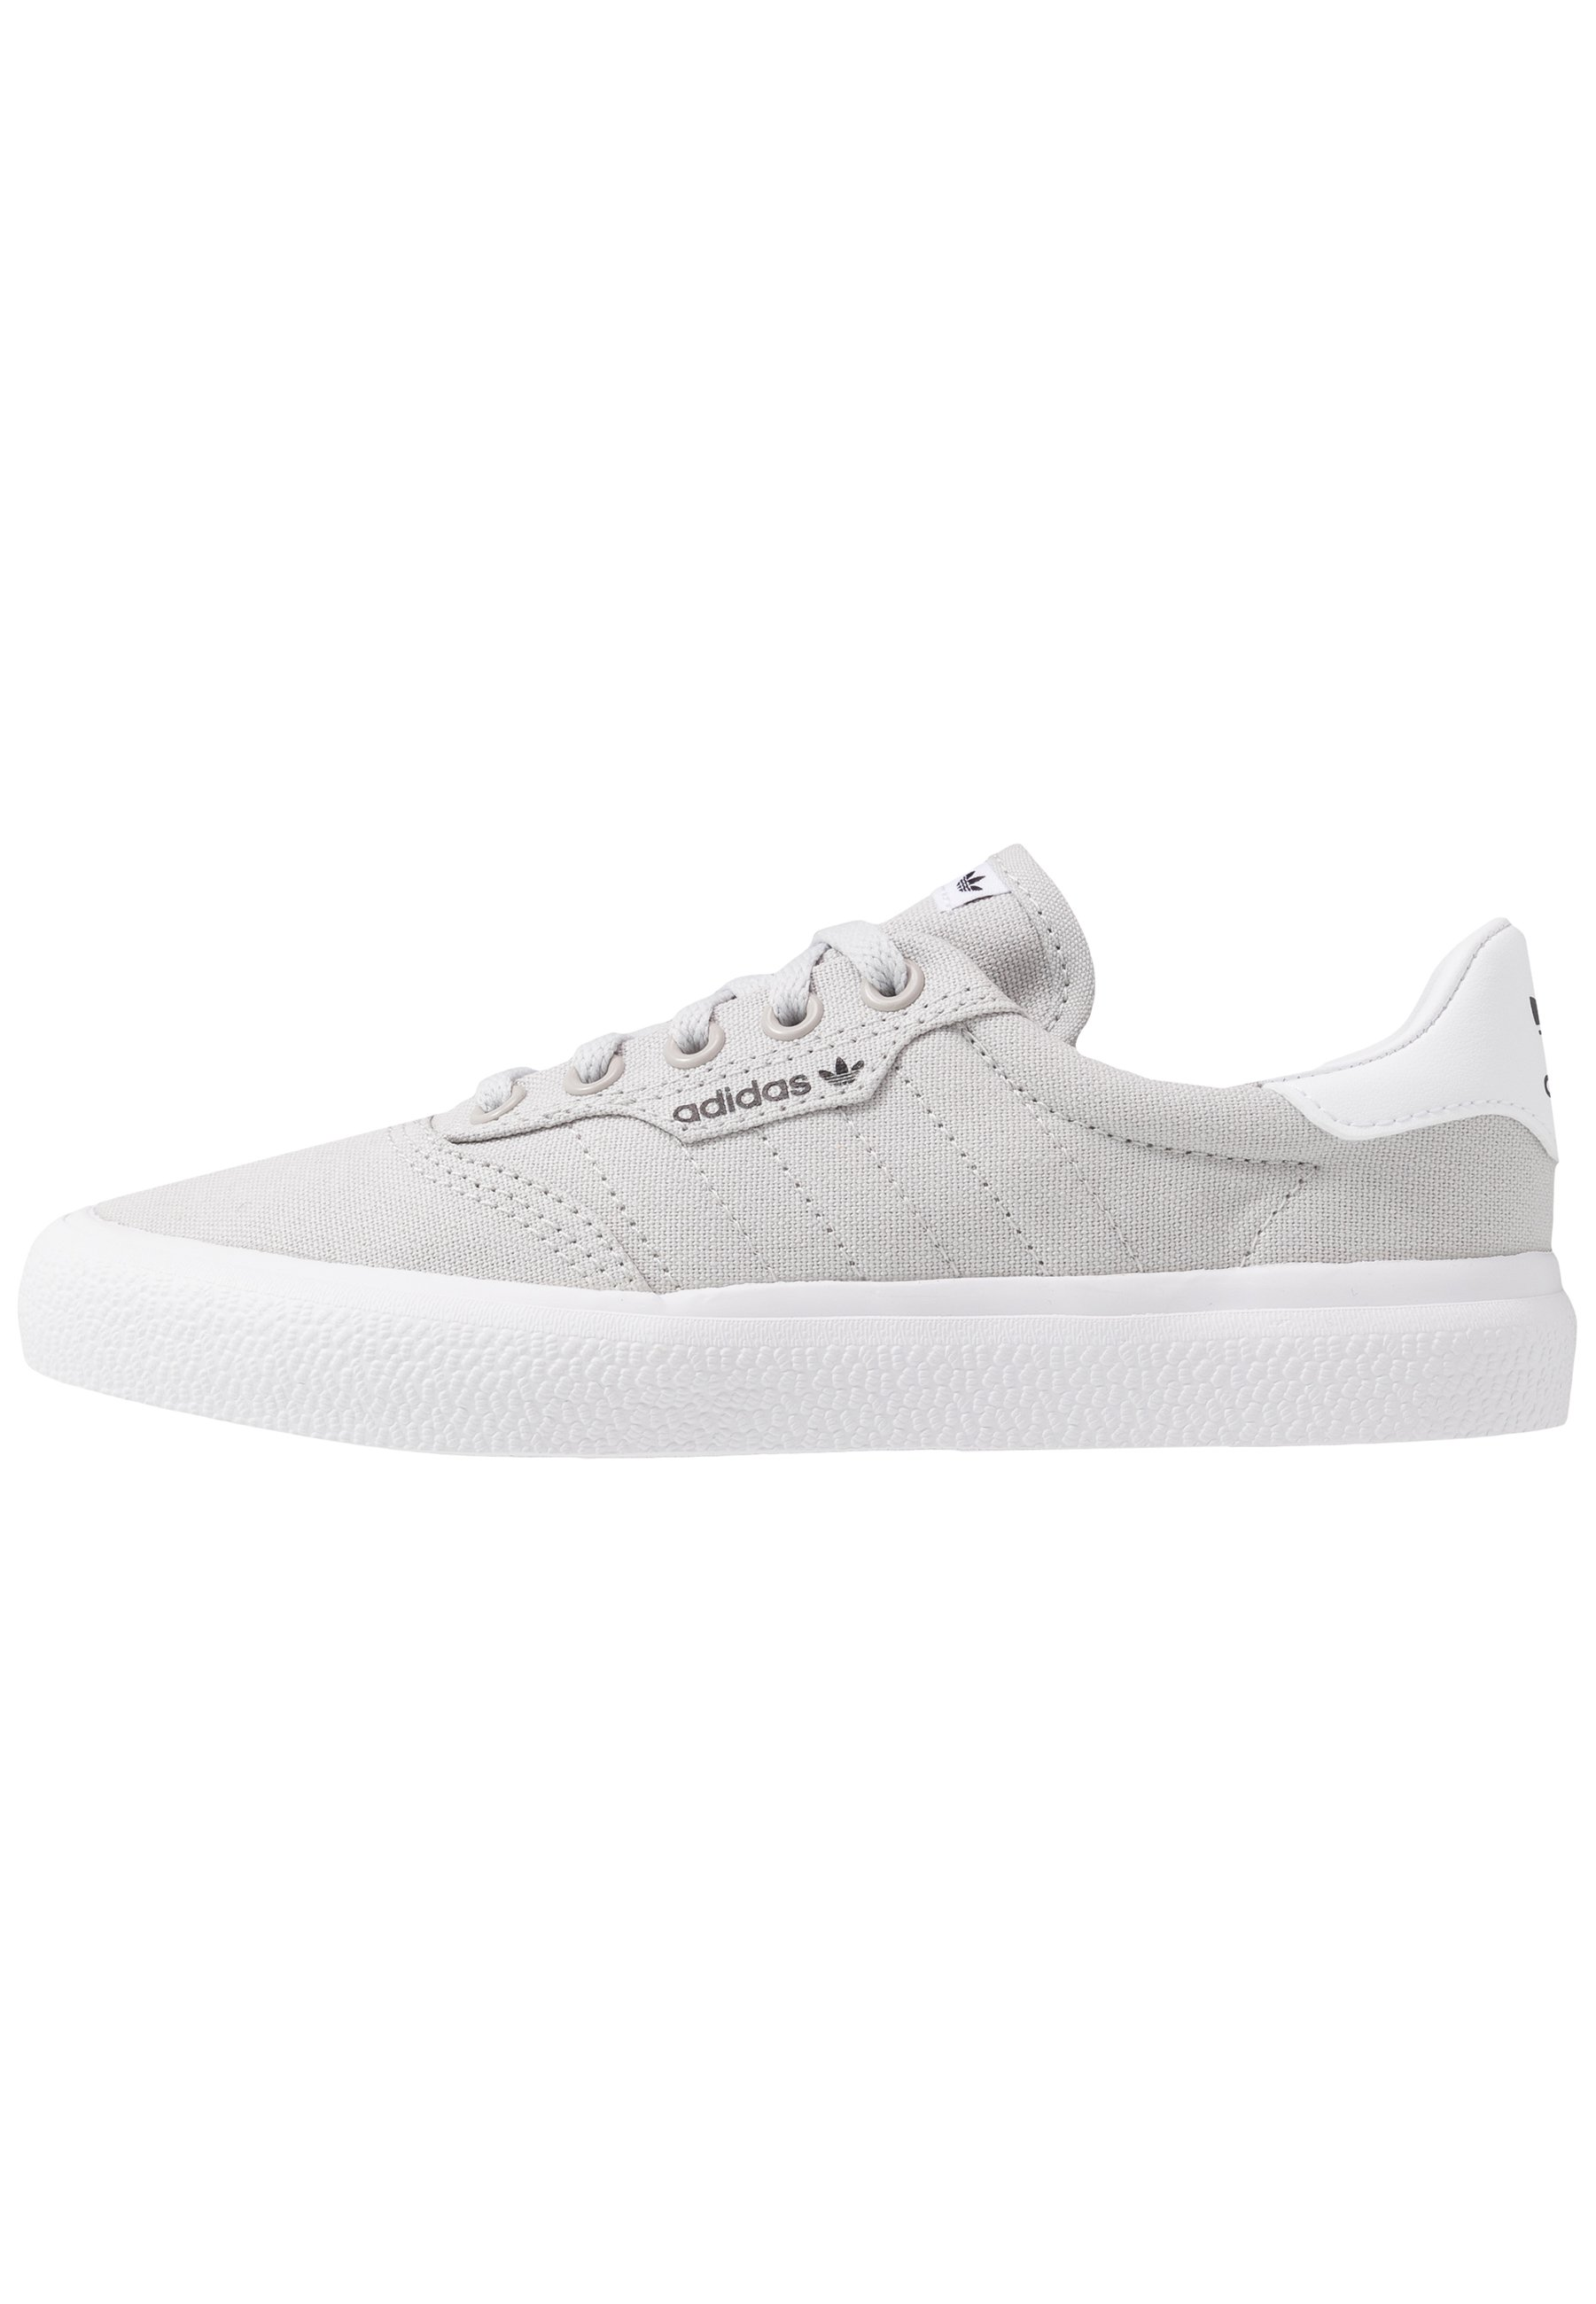 Adidas Originals 3mc - Sneakers Basse Light Solid Grey/footwear White 5y5lvz6